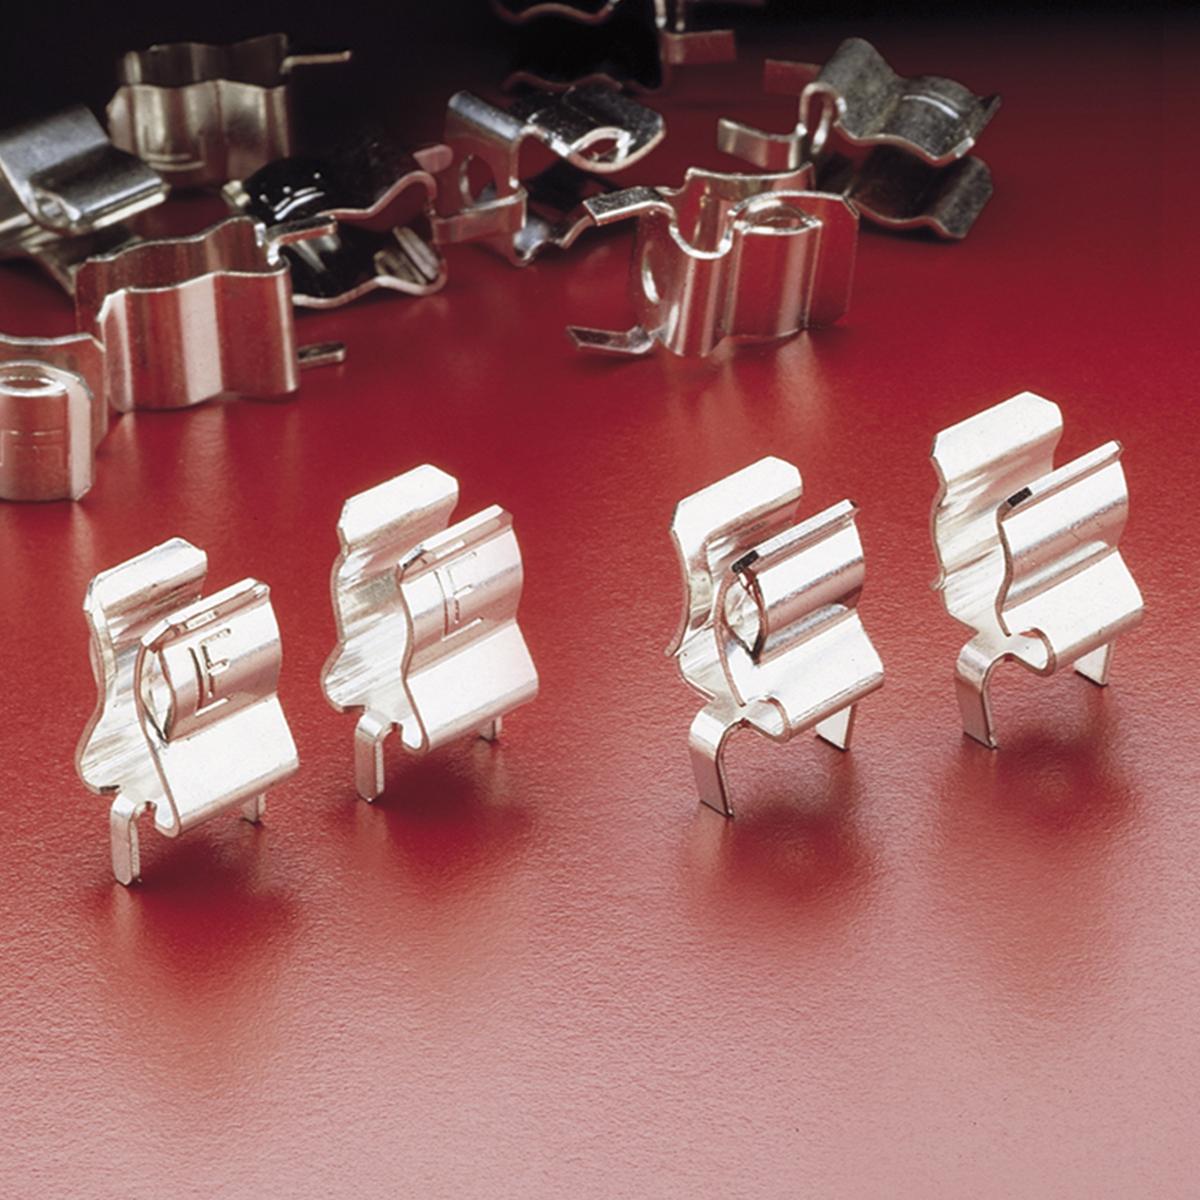 [SCHEMATICS_4LK]  Fuse Clips - Littelfuse | Fuse Box Repair Clips |  | Littelfuse